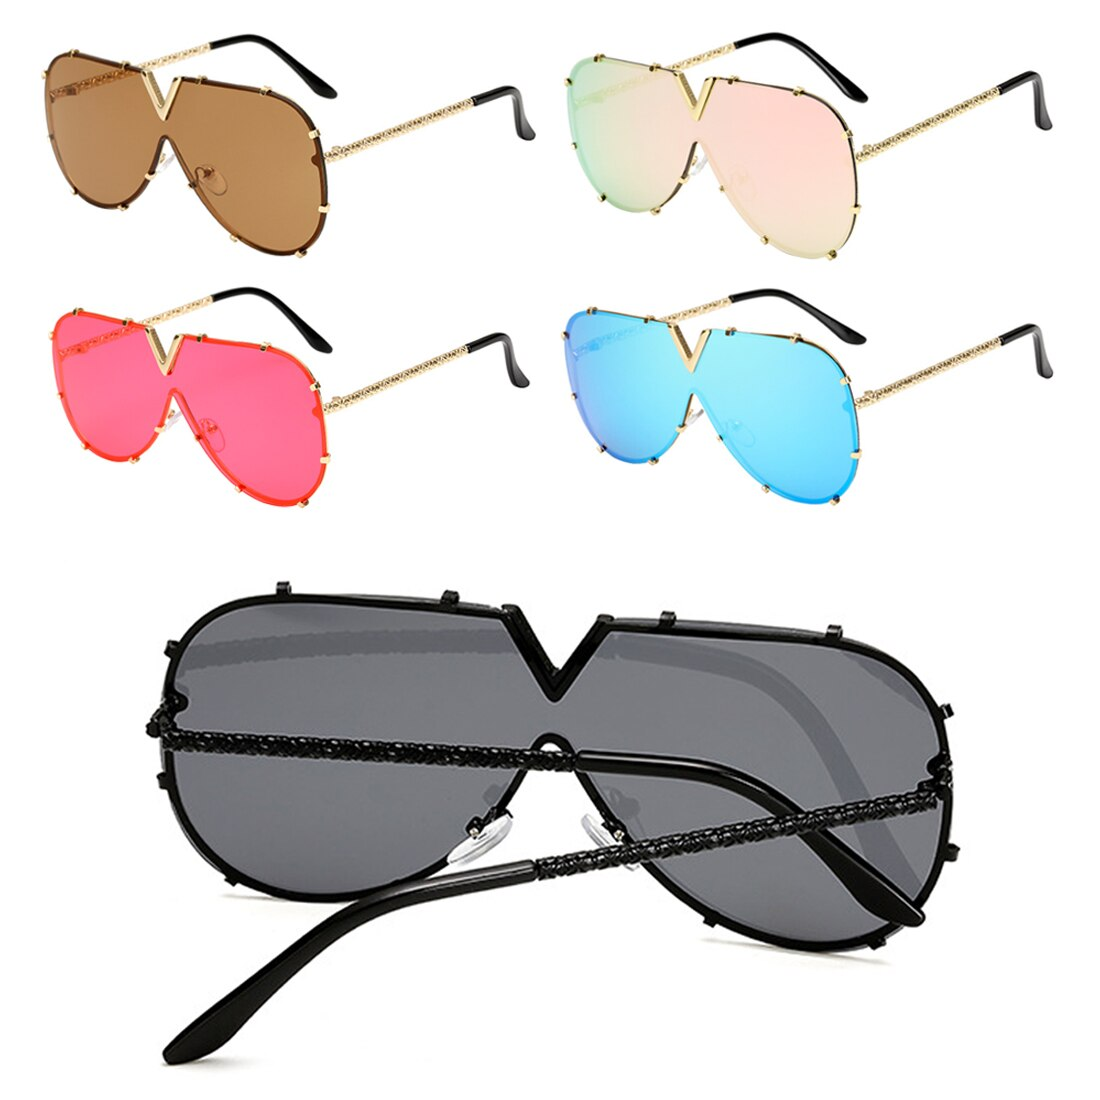 Fashion V Oversized Sunglasses Men Women Mirror Driving Sunglass Eyewear 2019 Luxury Brand Cool Metal Frame UV400 Sun Glasses